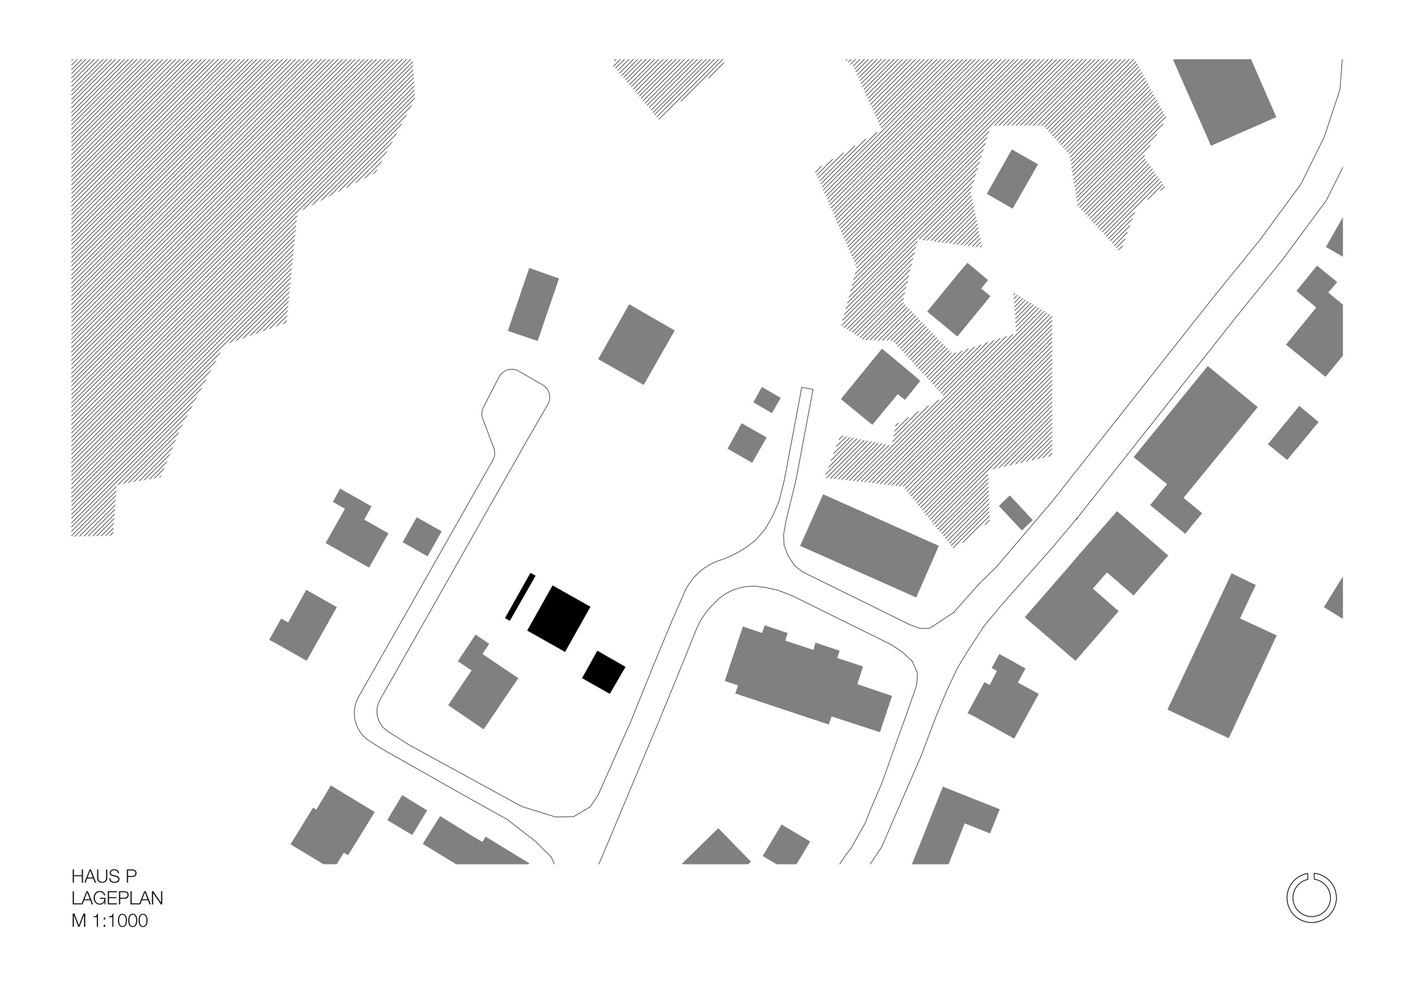 House P,Site Plan